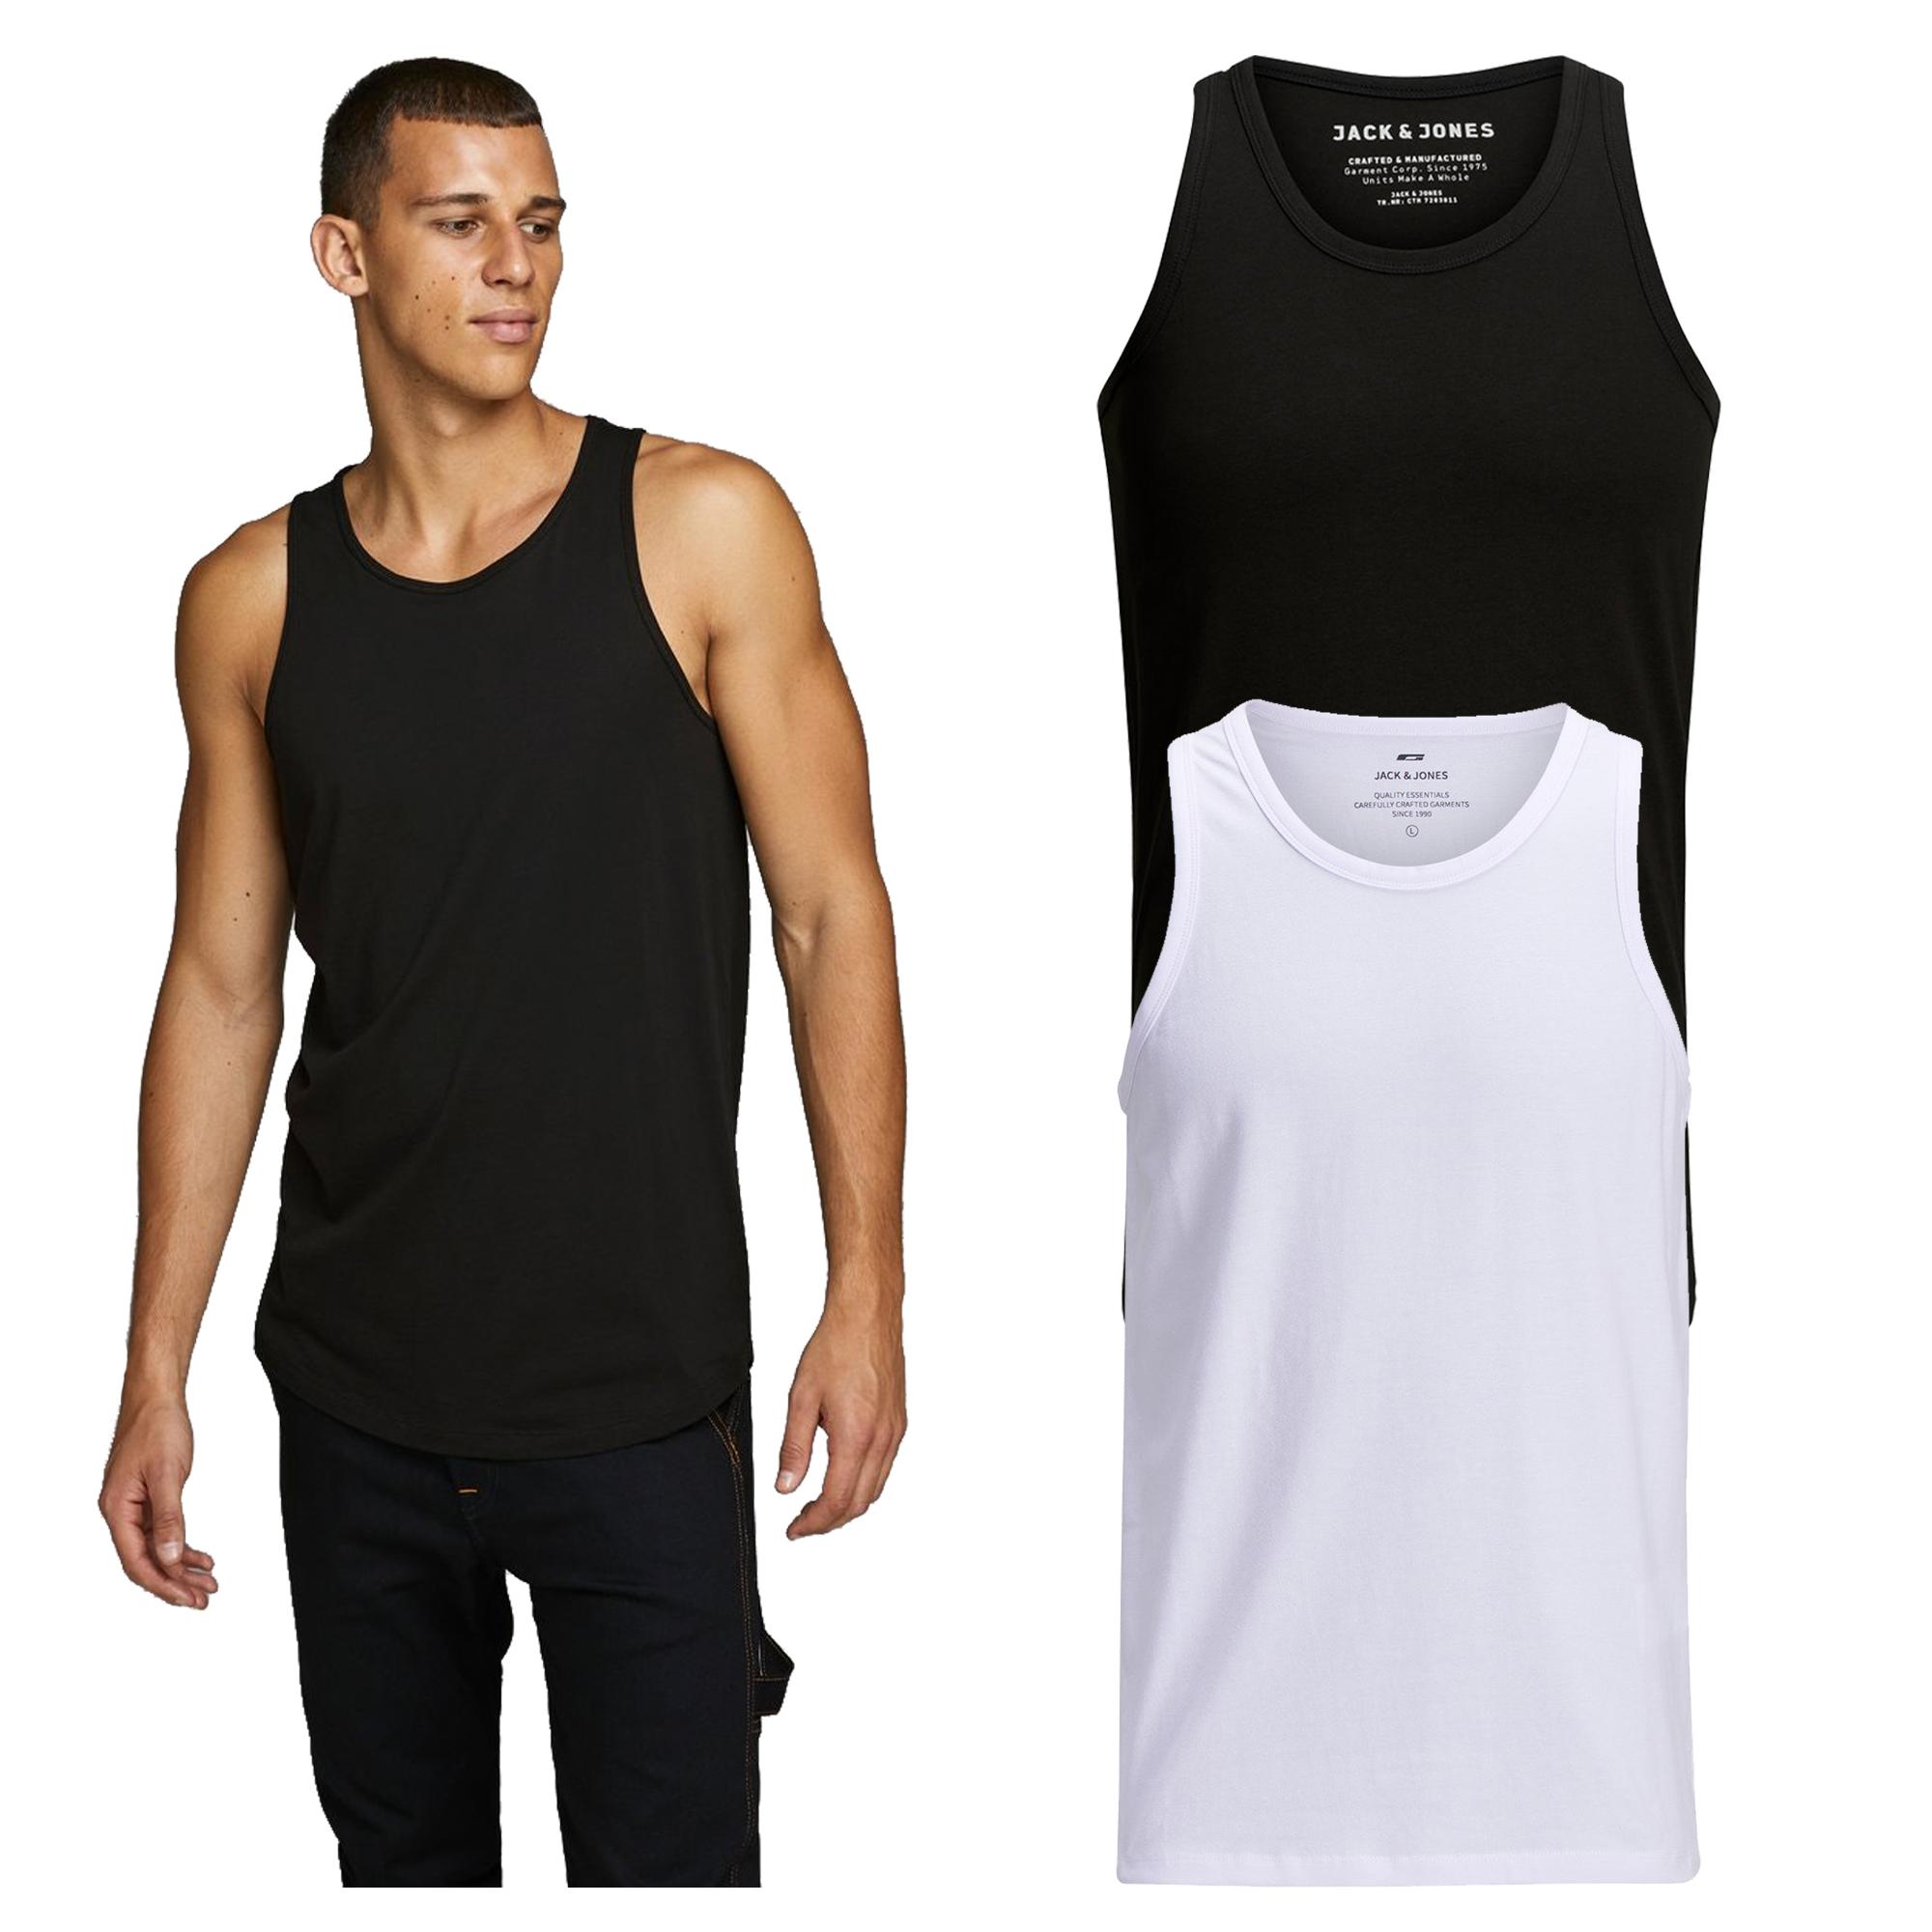 Jack /& Jones Mens Tank Tops Casual Sports Gym Sleeveless Vests White